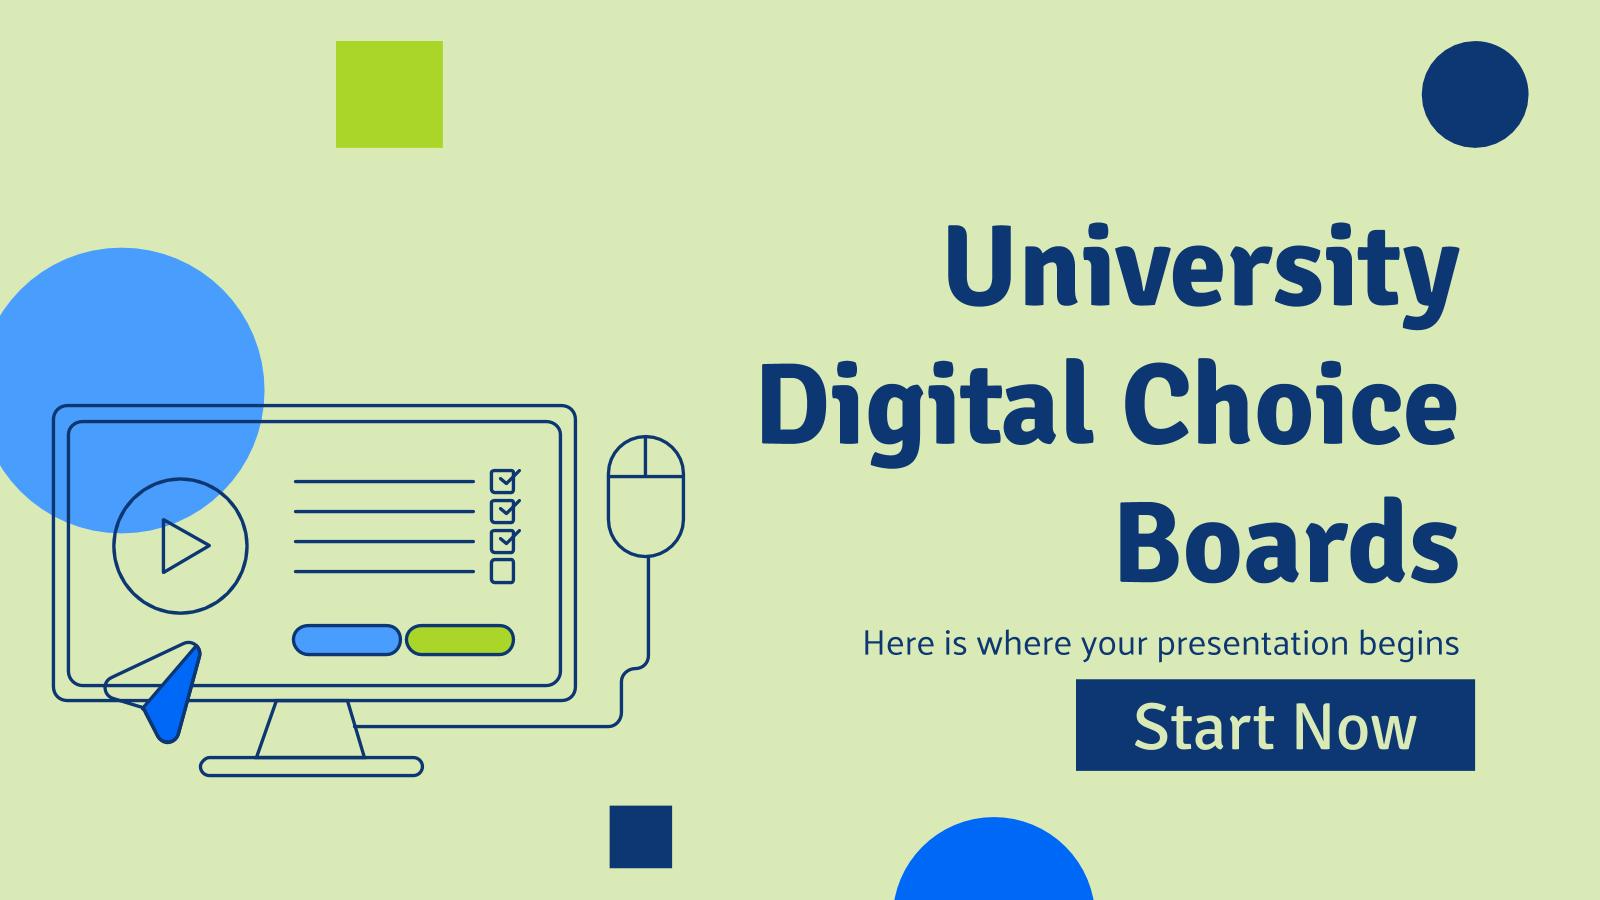 University Digital Choice Boards presentation template